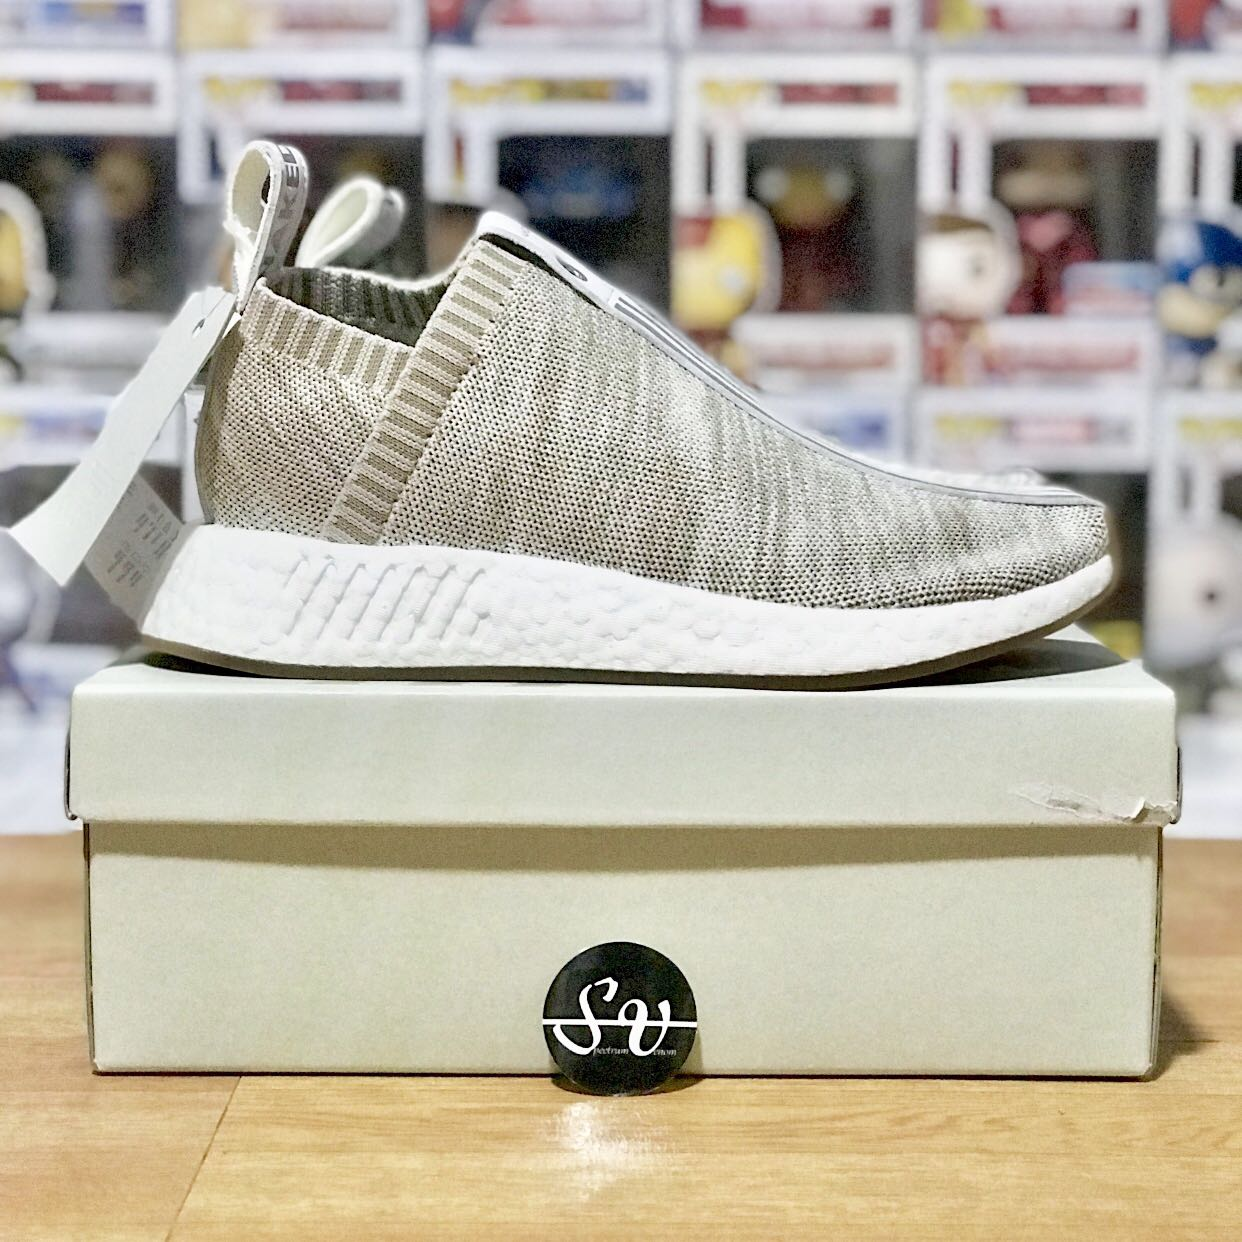 256f12258 SALE  Adidas Originals x Naked x Kith NMD Chukka City Sock CS2 ...